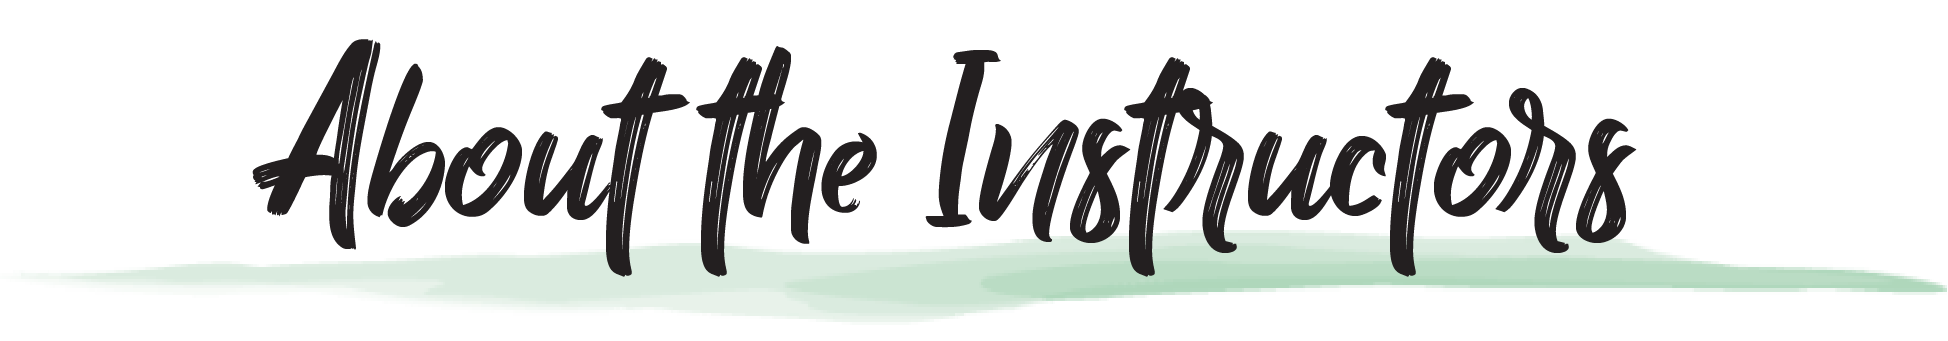 About Instructors